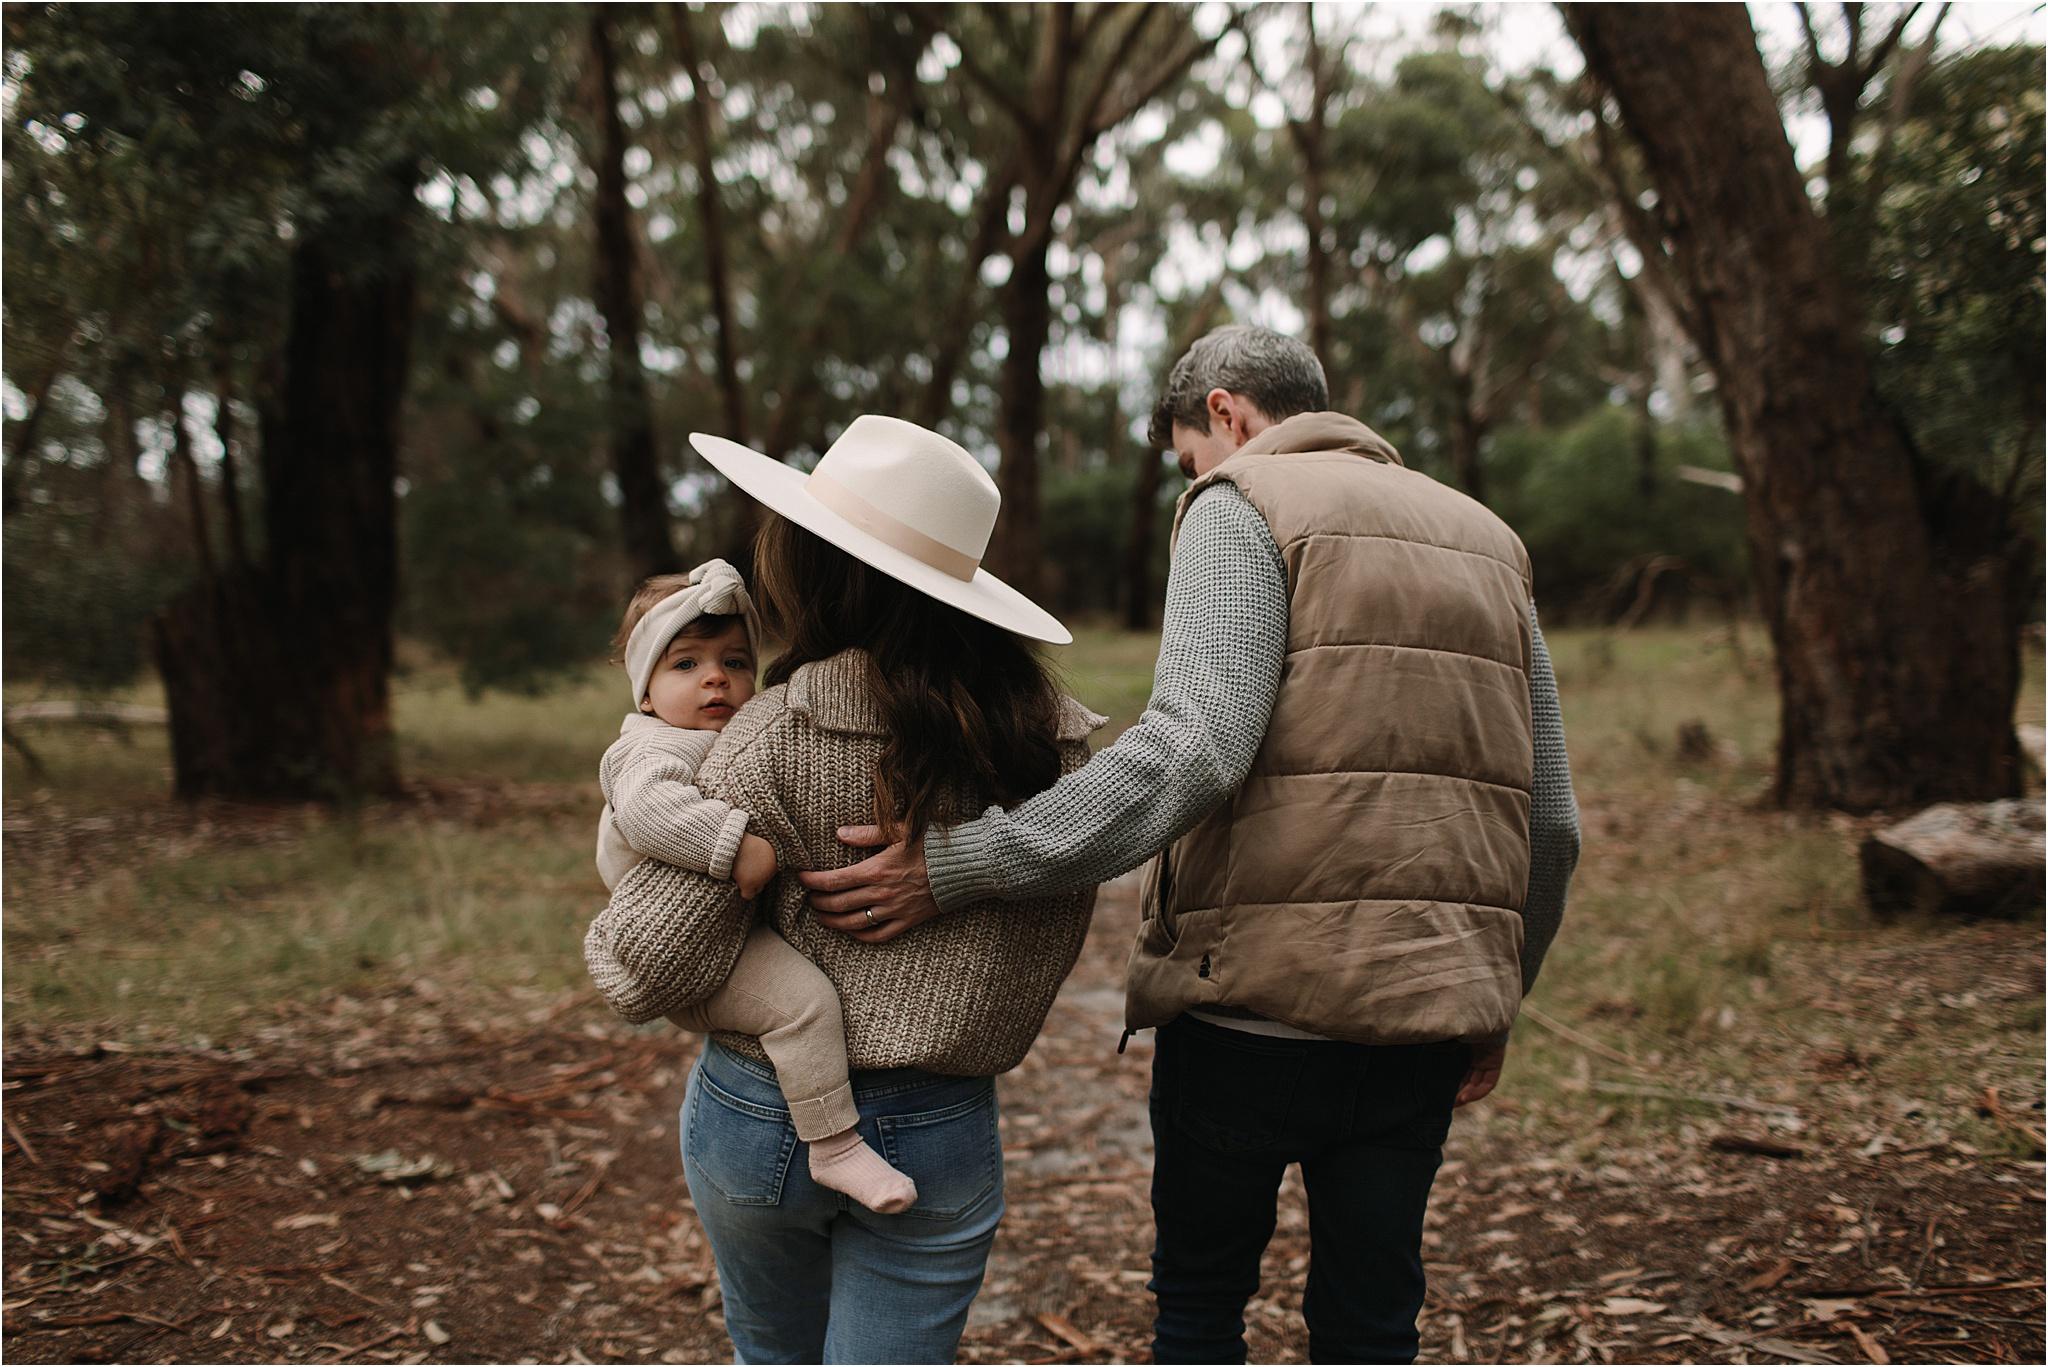 Mum, Dad and baby walking away, Dad holding onto mums back